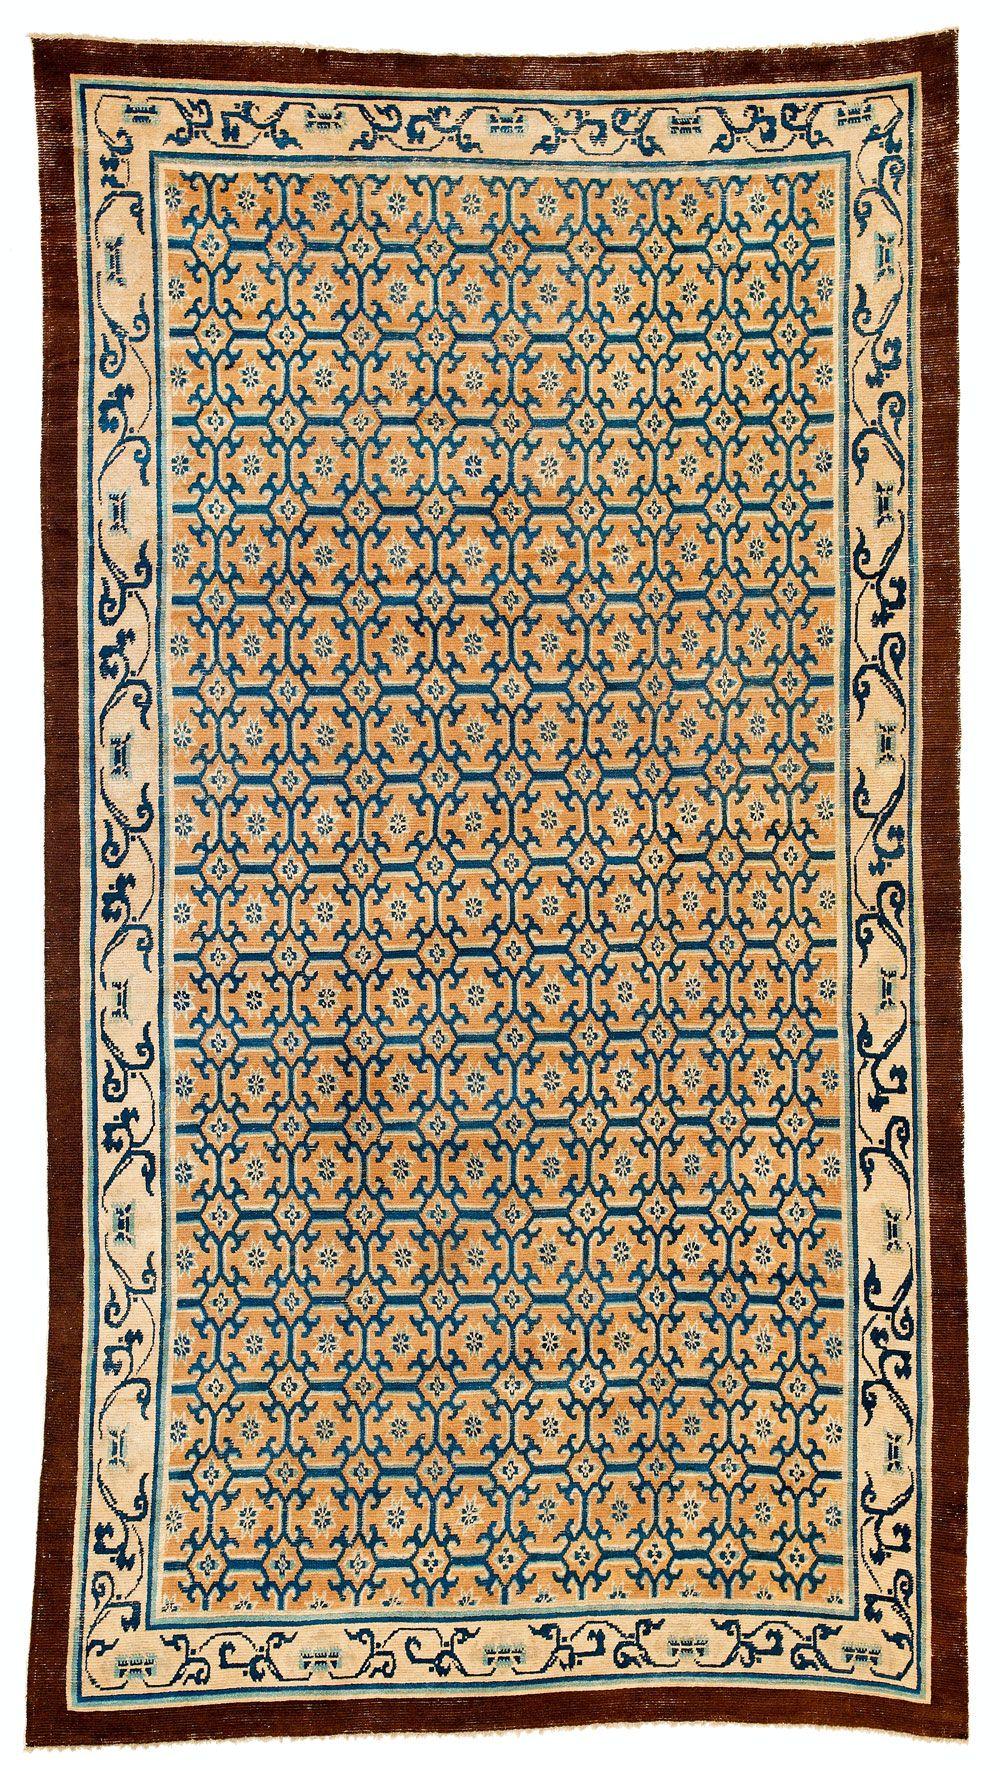 Ningxia carpet, west China, second half 18th century